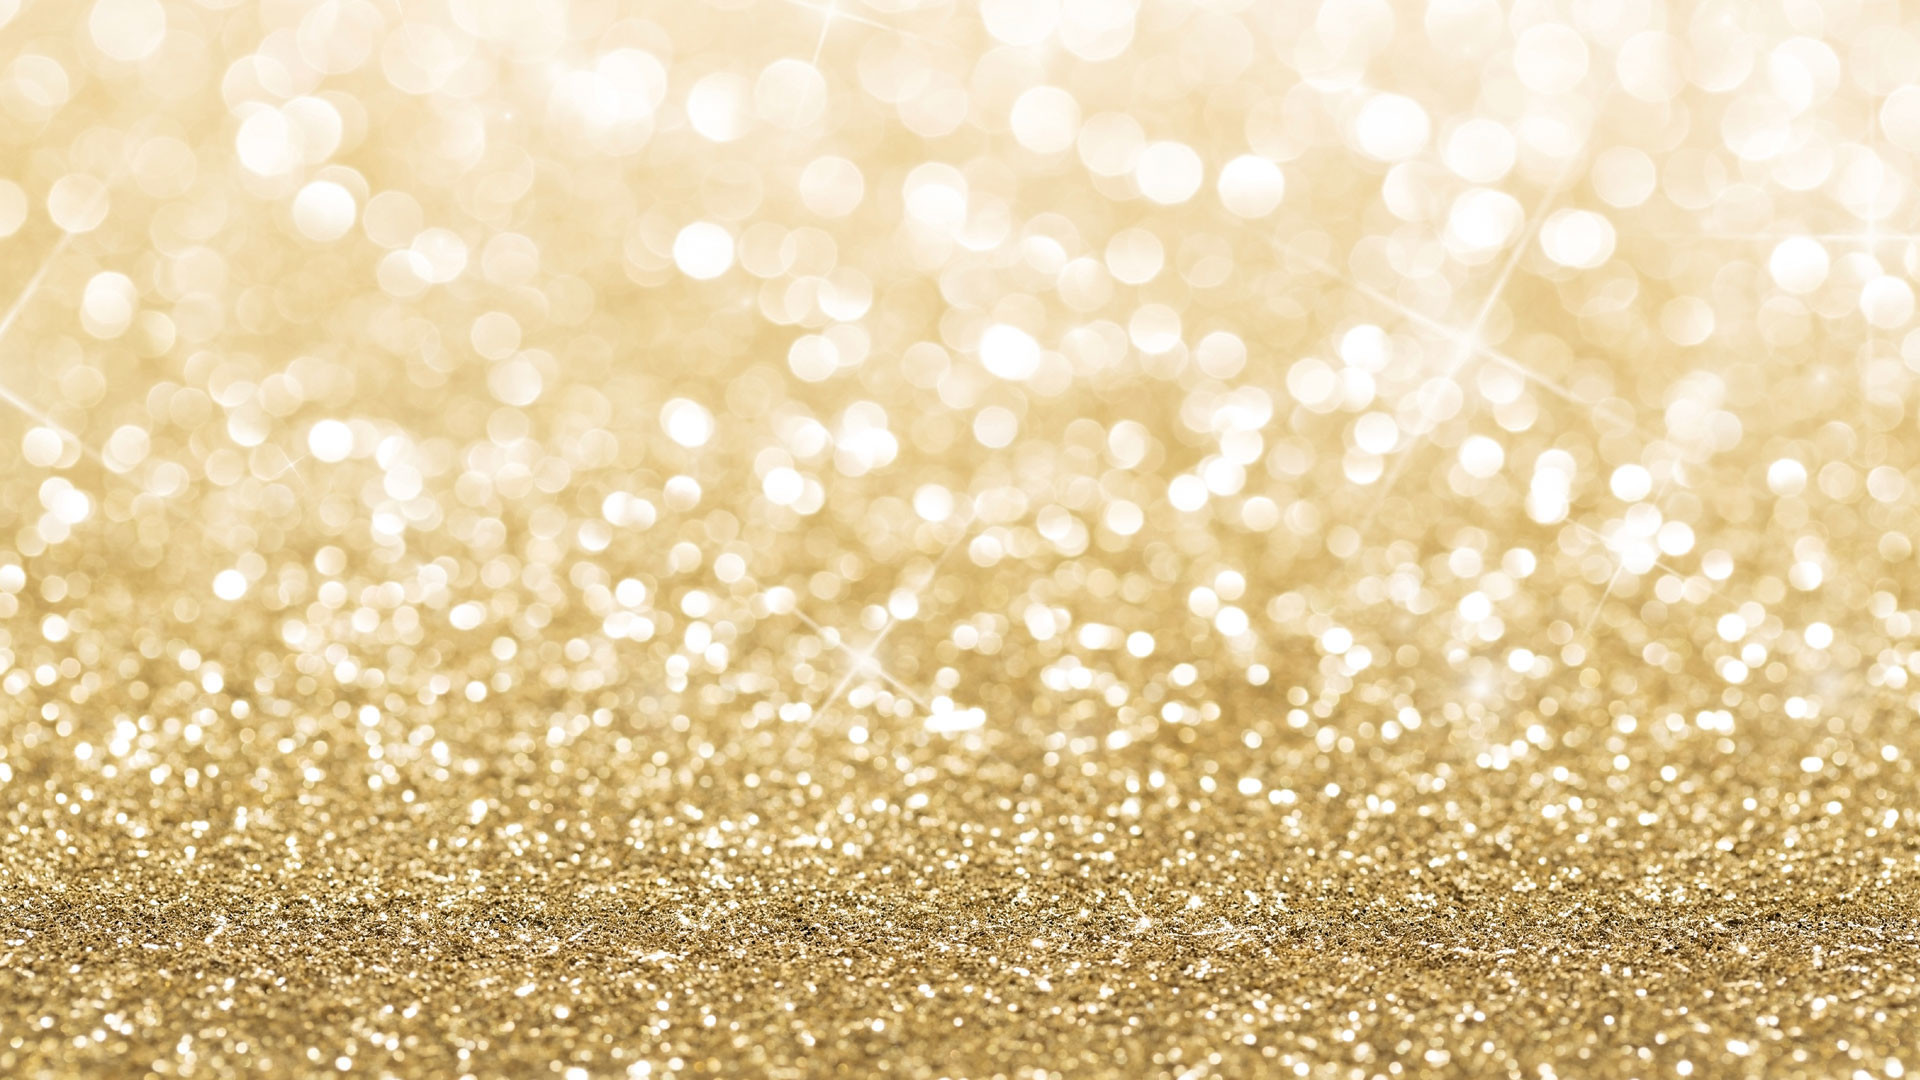 Res: 1920x1080,  Free Glitter Wallpaper | HD Wallpapers | Pinterest | Glitter  wallpaper, Glitter background and